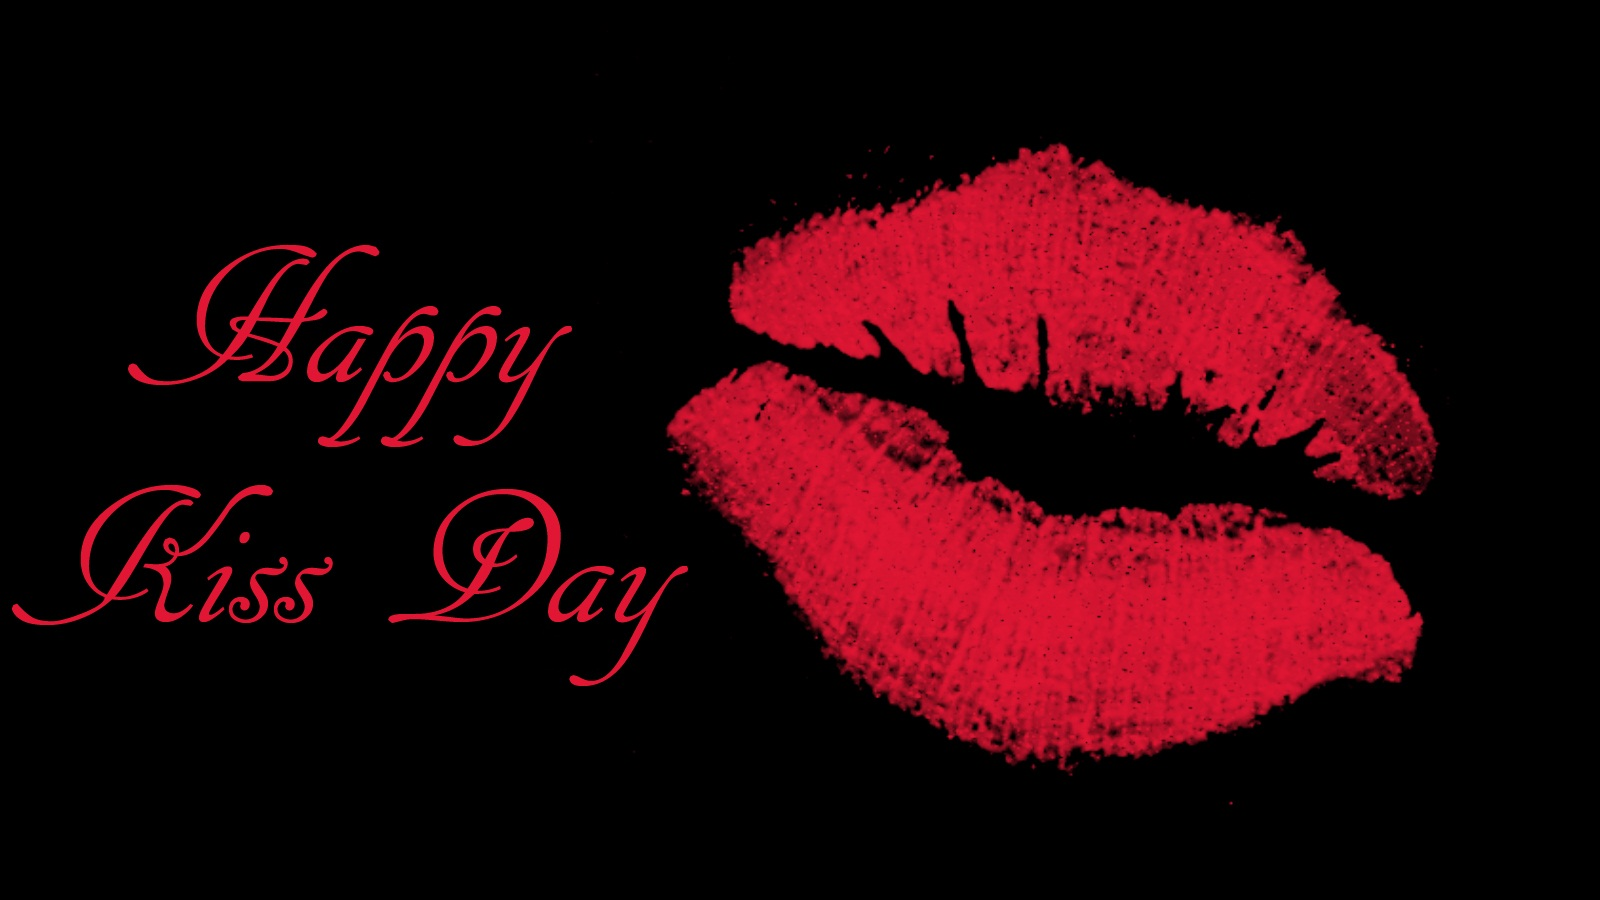 Kiss Day Hot Lips